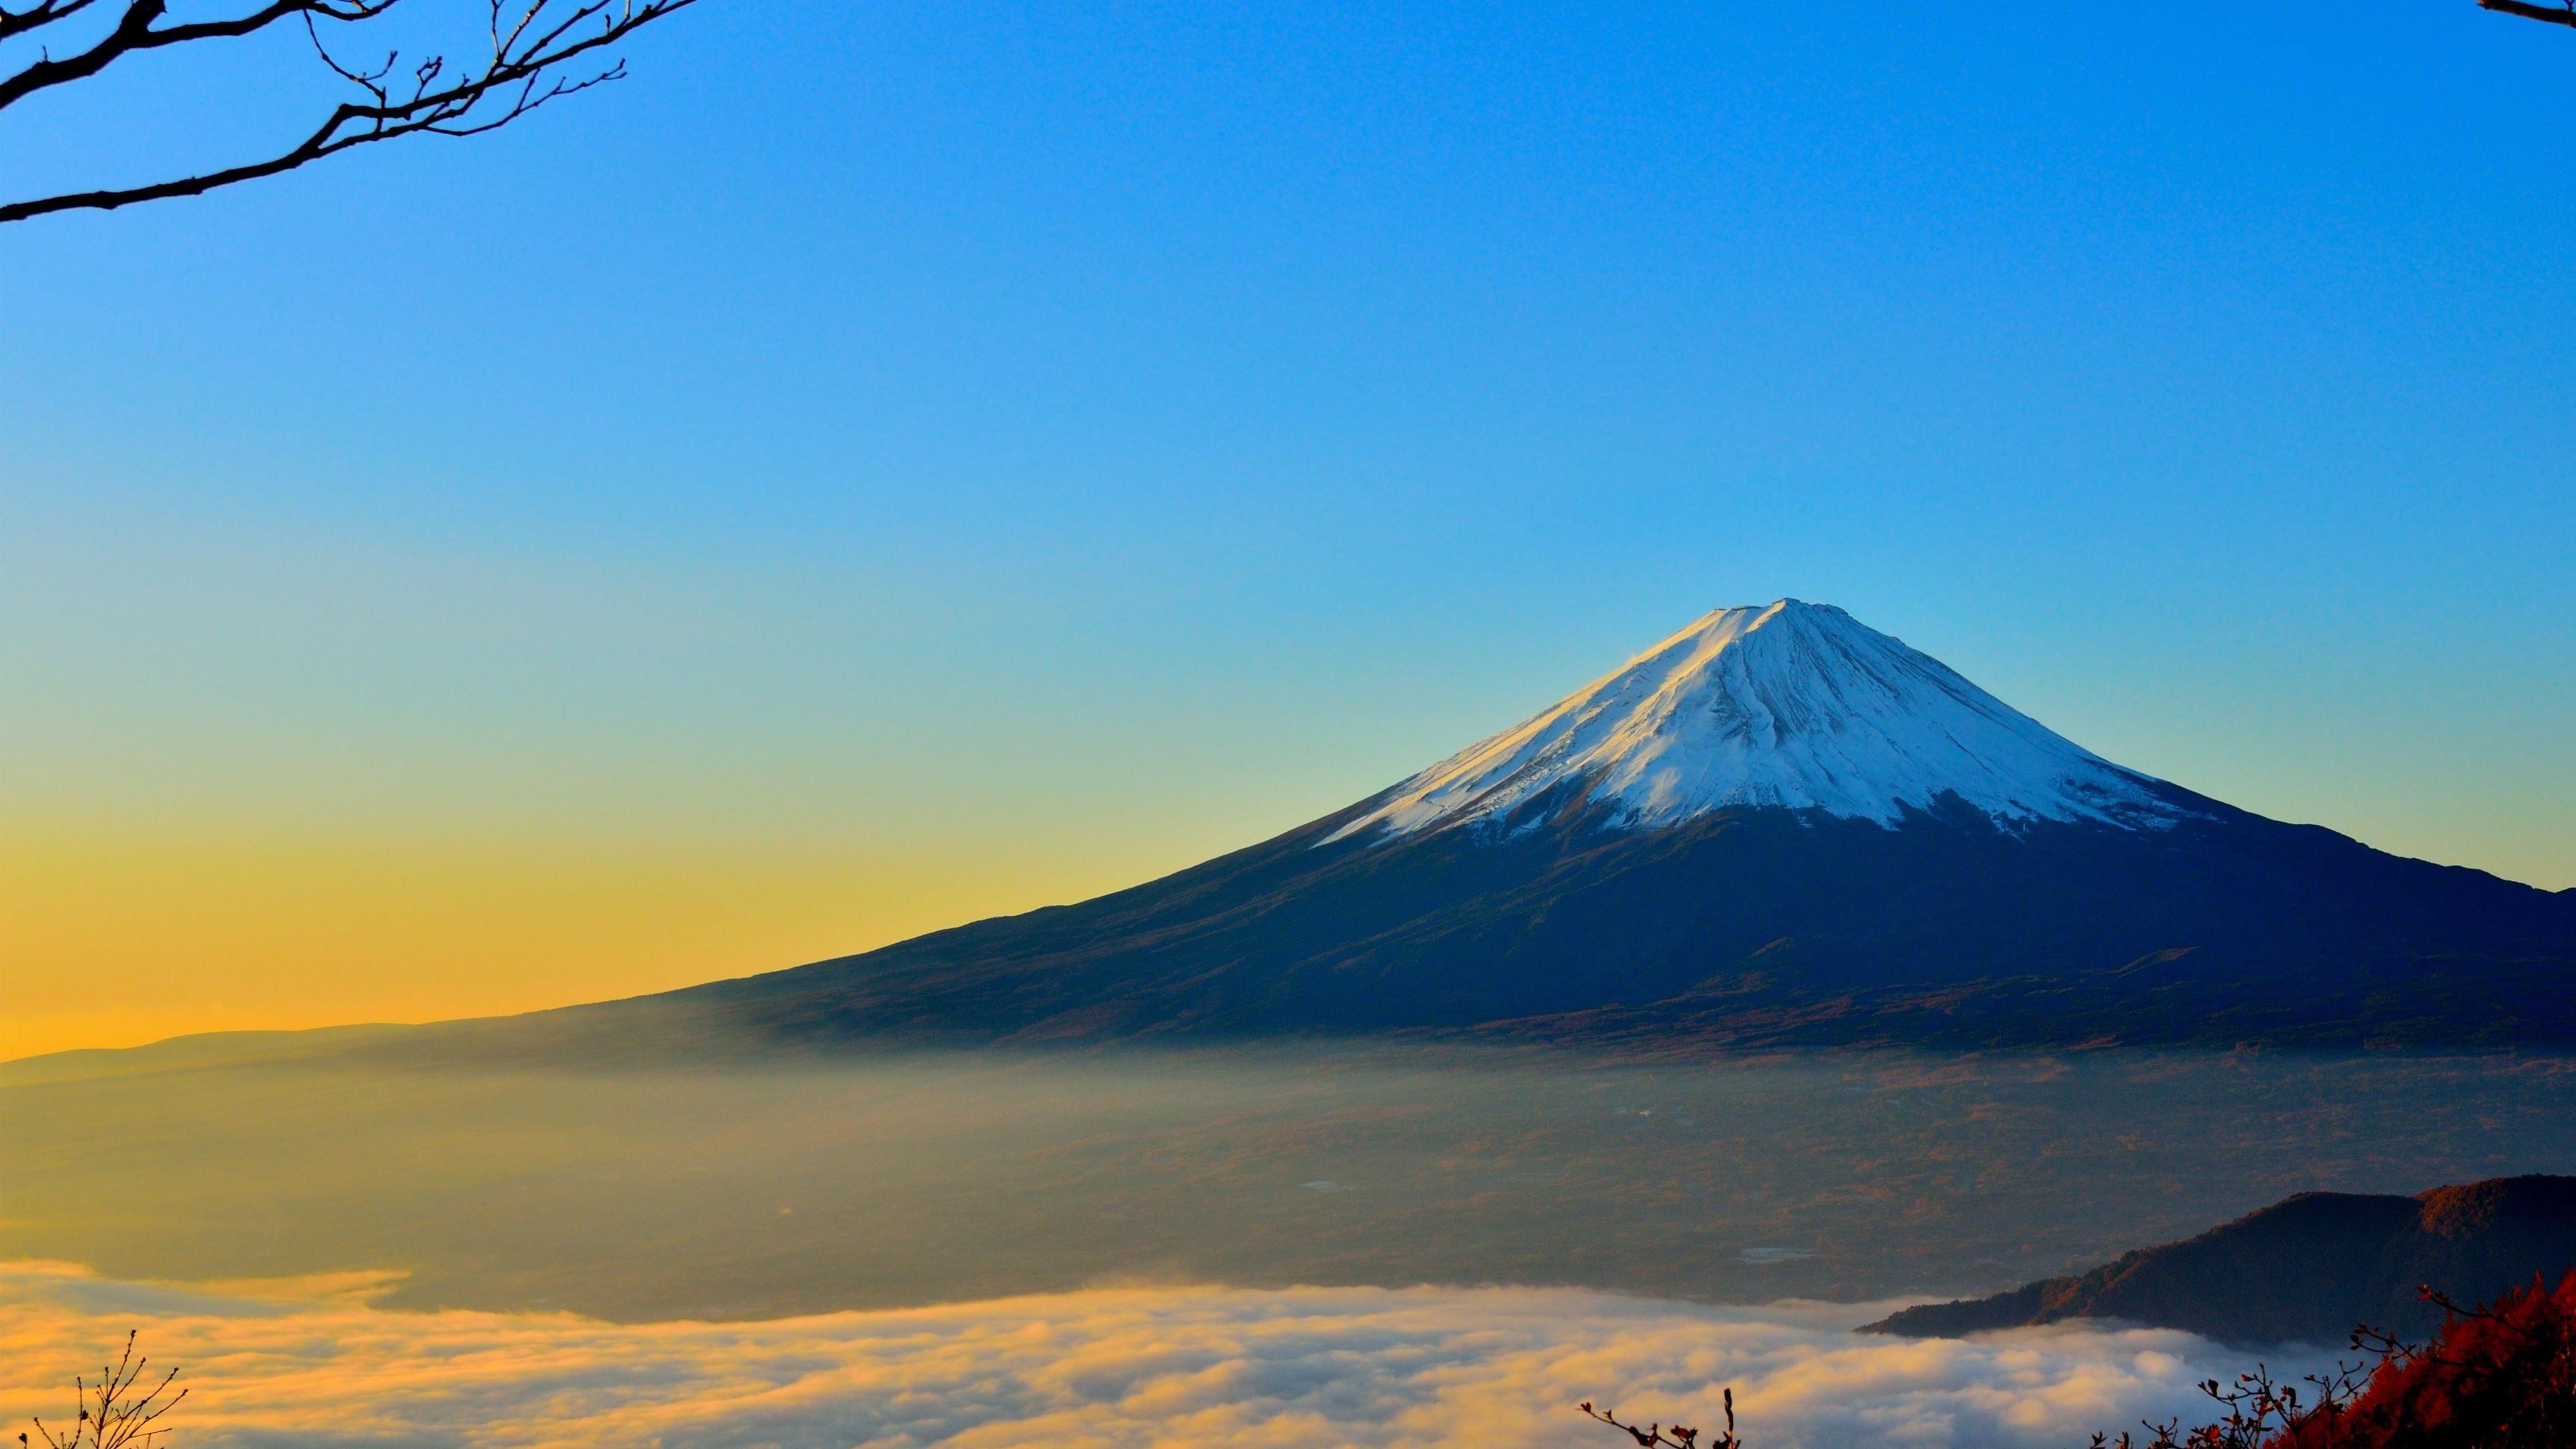 Mount Fuji HD Pretty Wallpapers   Top Mount Fuji HD Pretty 3840x2160